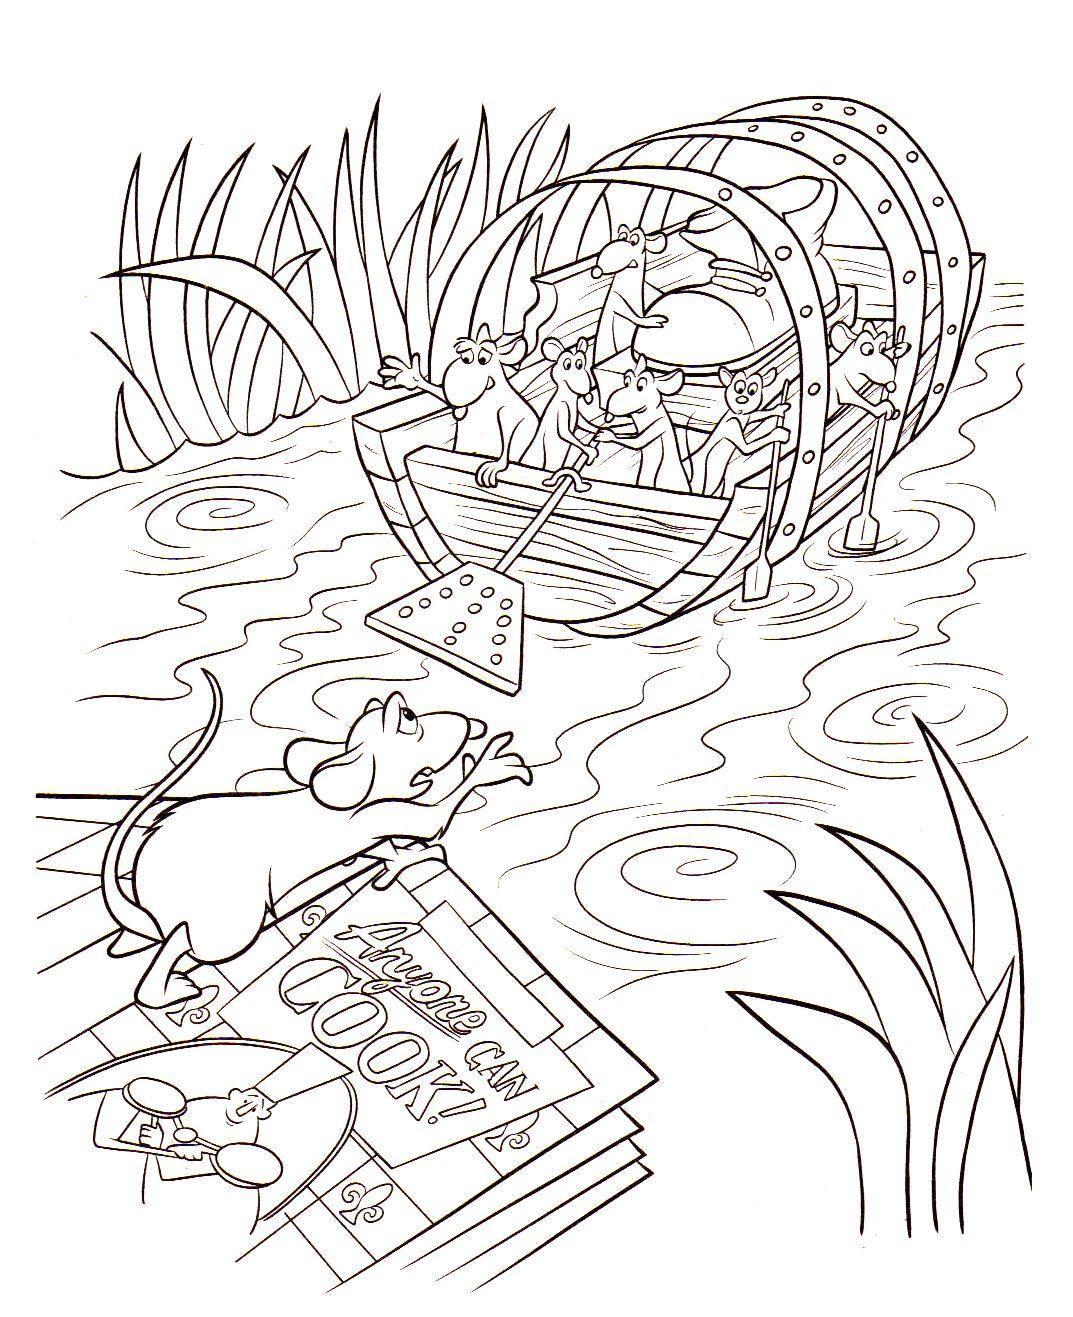 Ratatouille 1 coloriage ratatouille coloriages pour - Coloriage de ratatouille ...